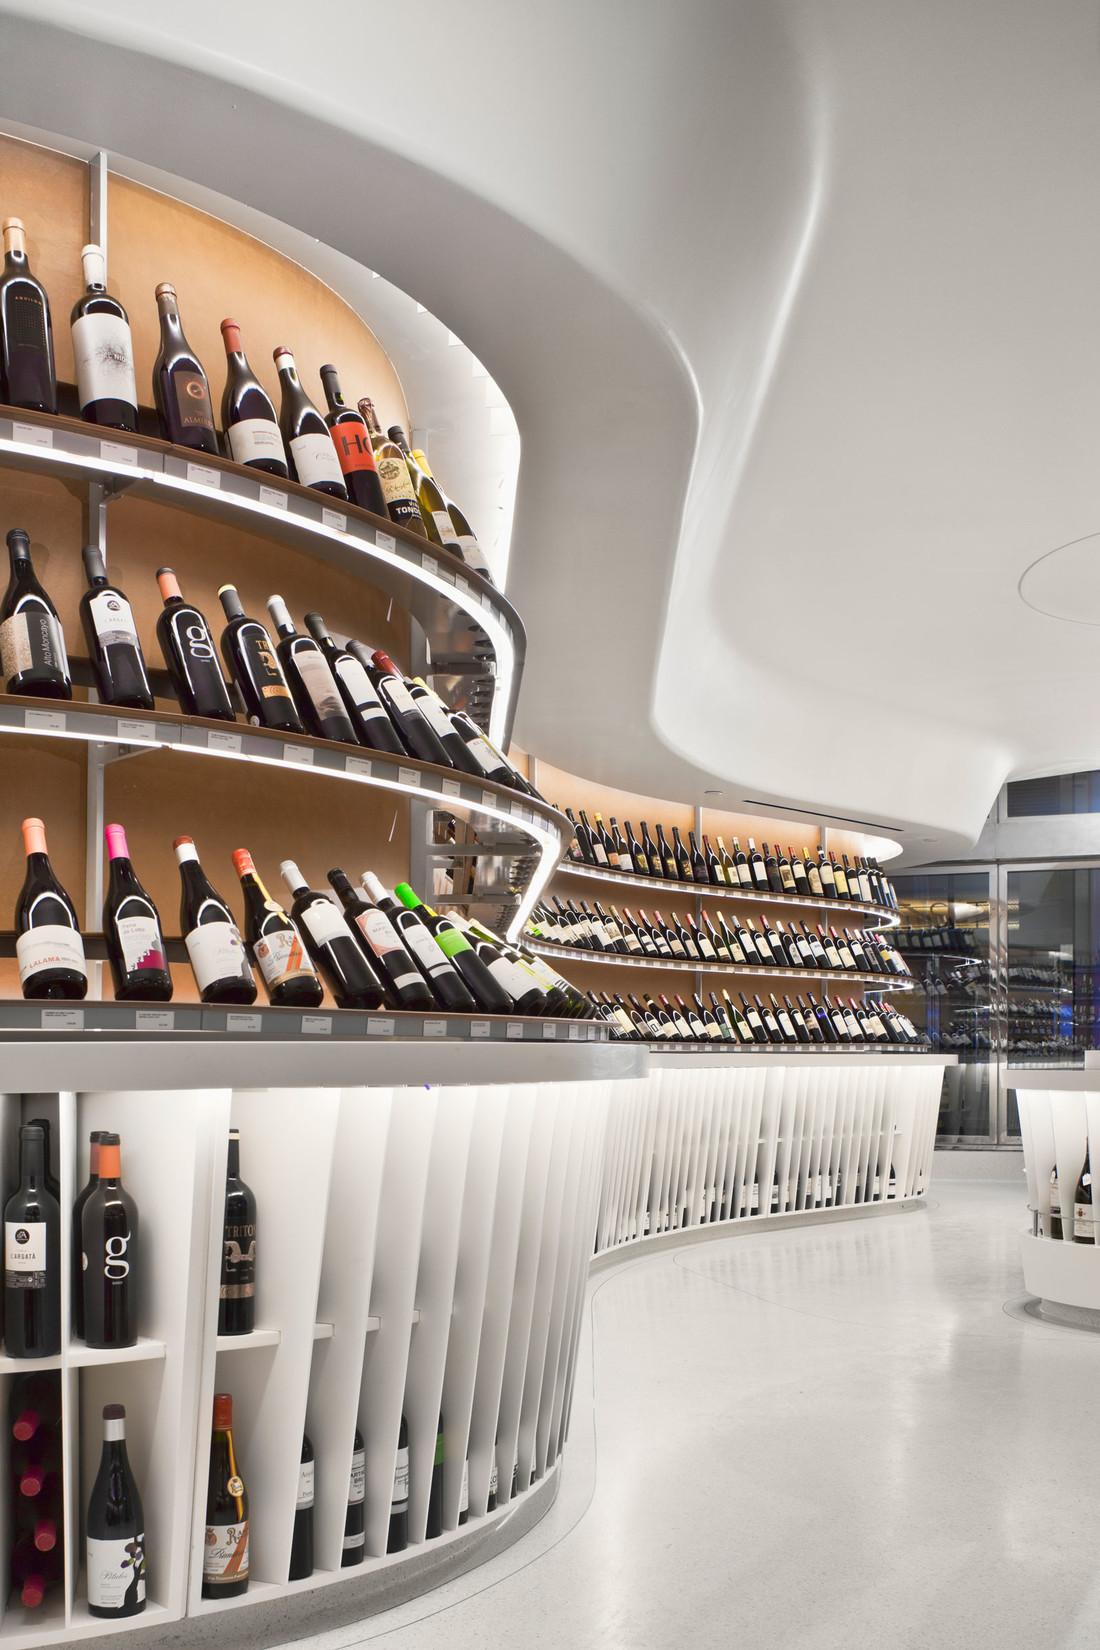 Vinitry-Fines-Wines-3